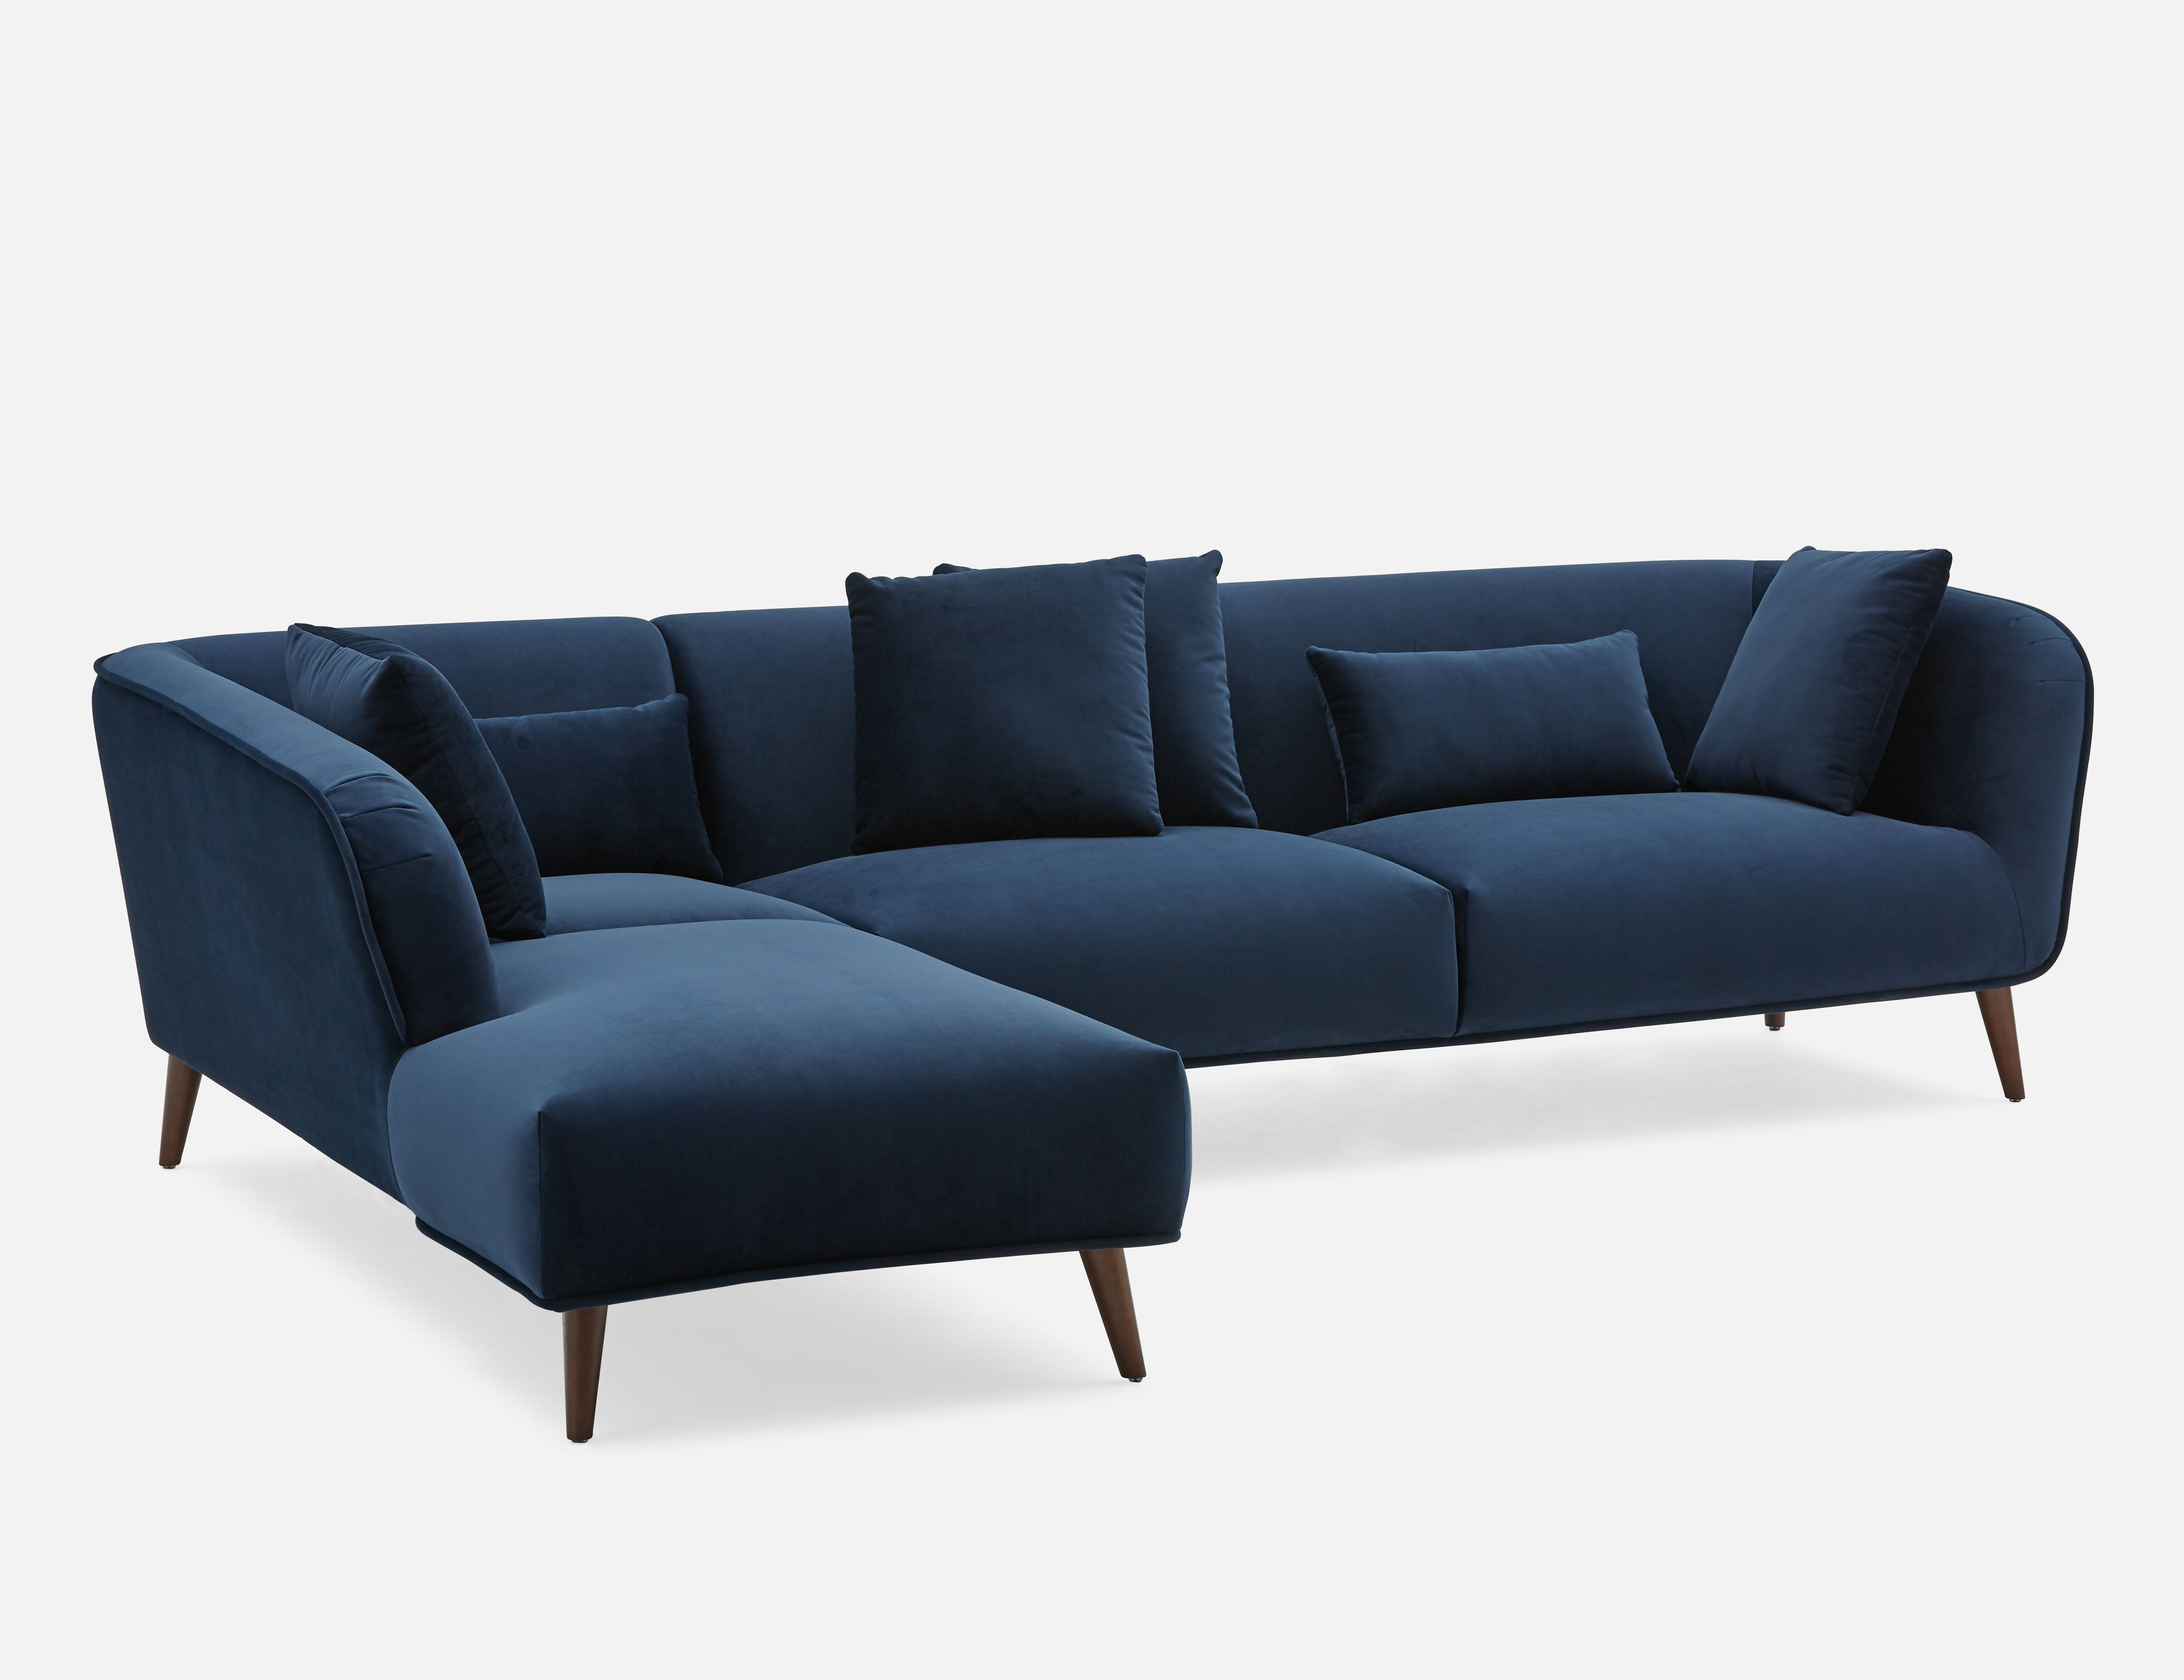 Midnight Left Facing Sectional Sofa Structube Delano Canape Angle Canape Modulaire Meuble